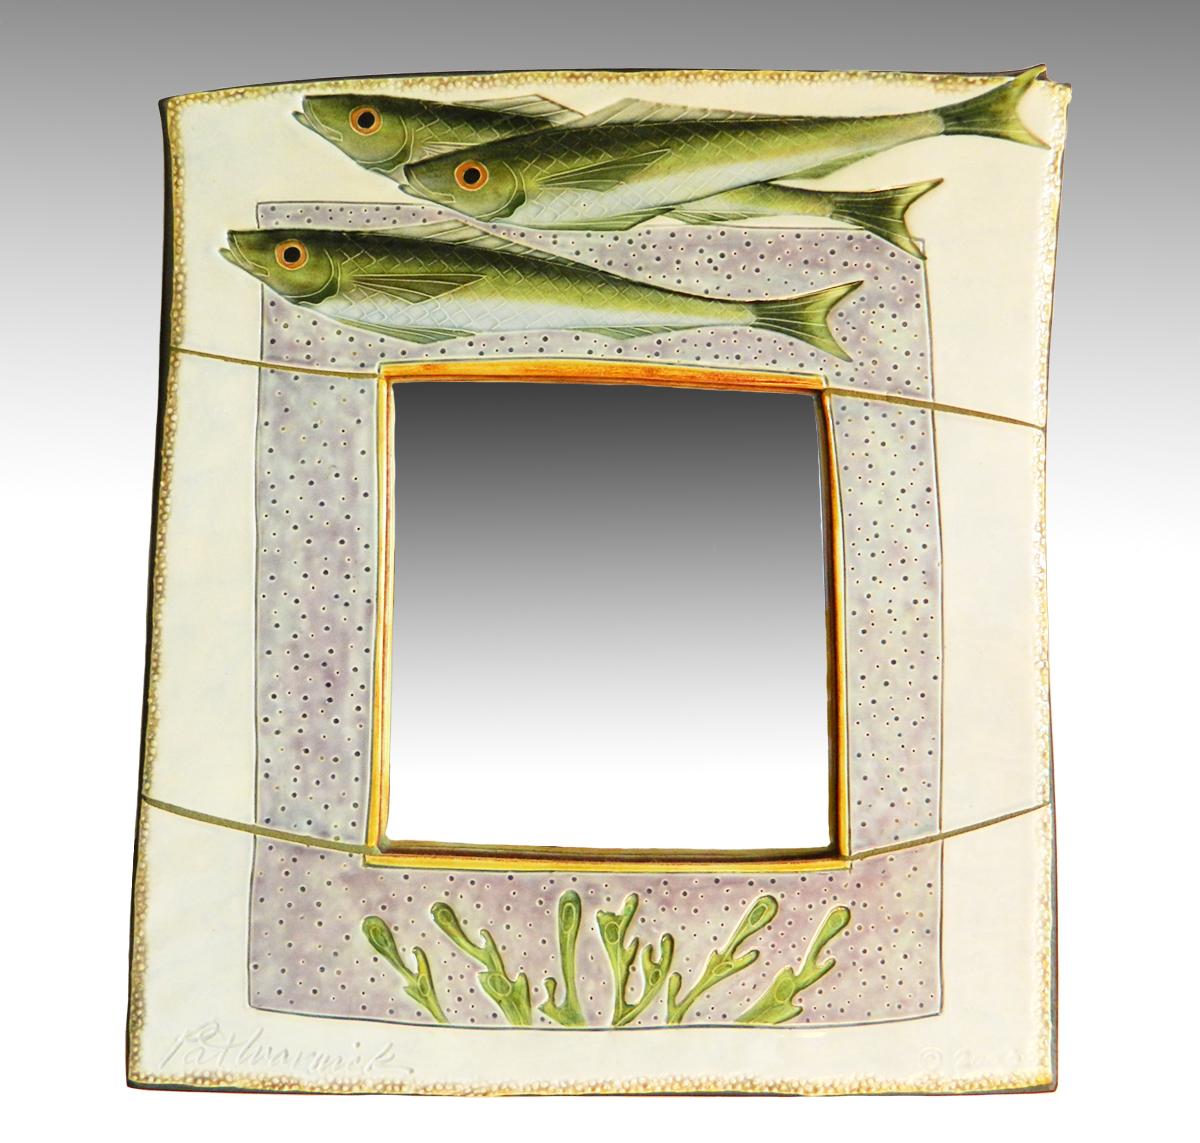 fish mirror